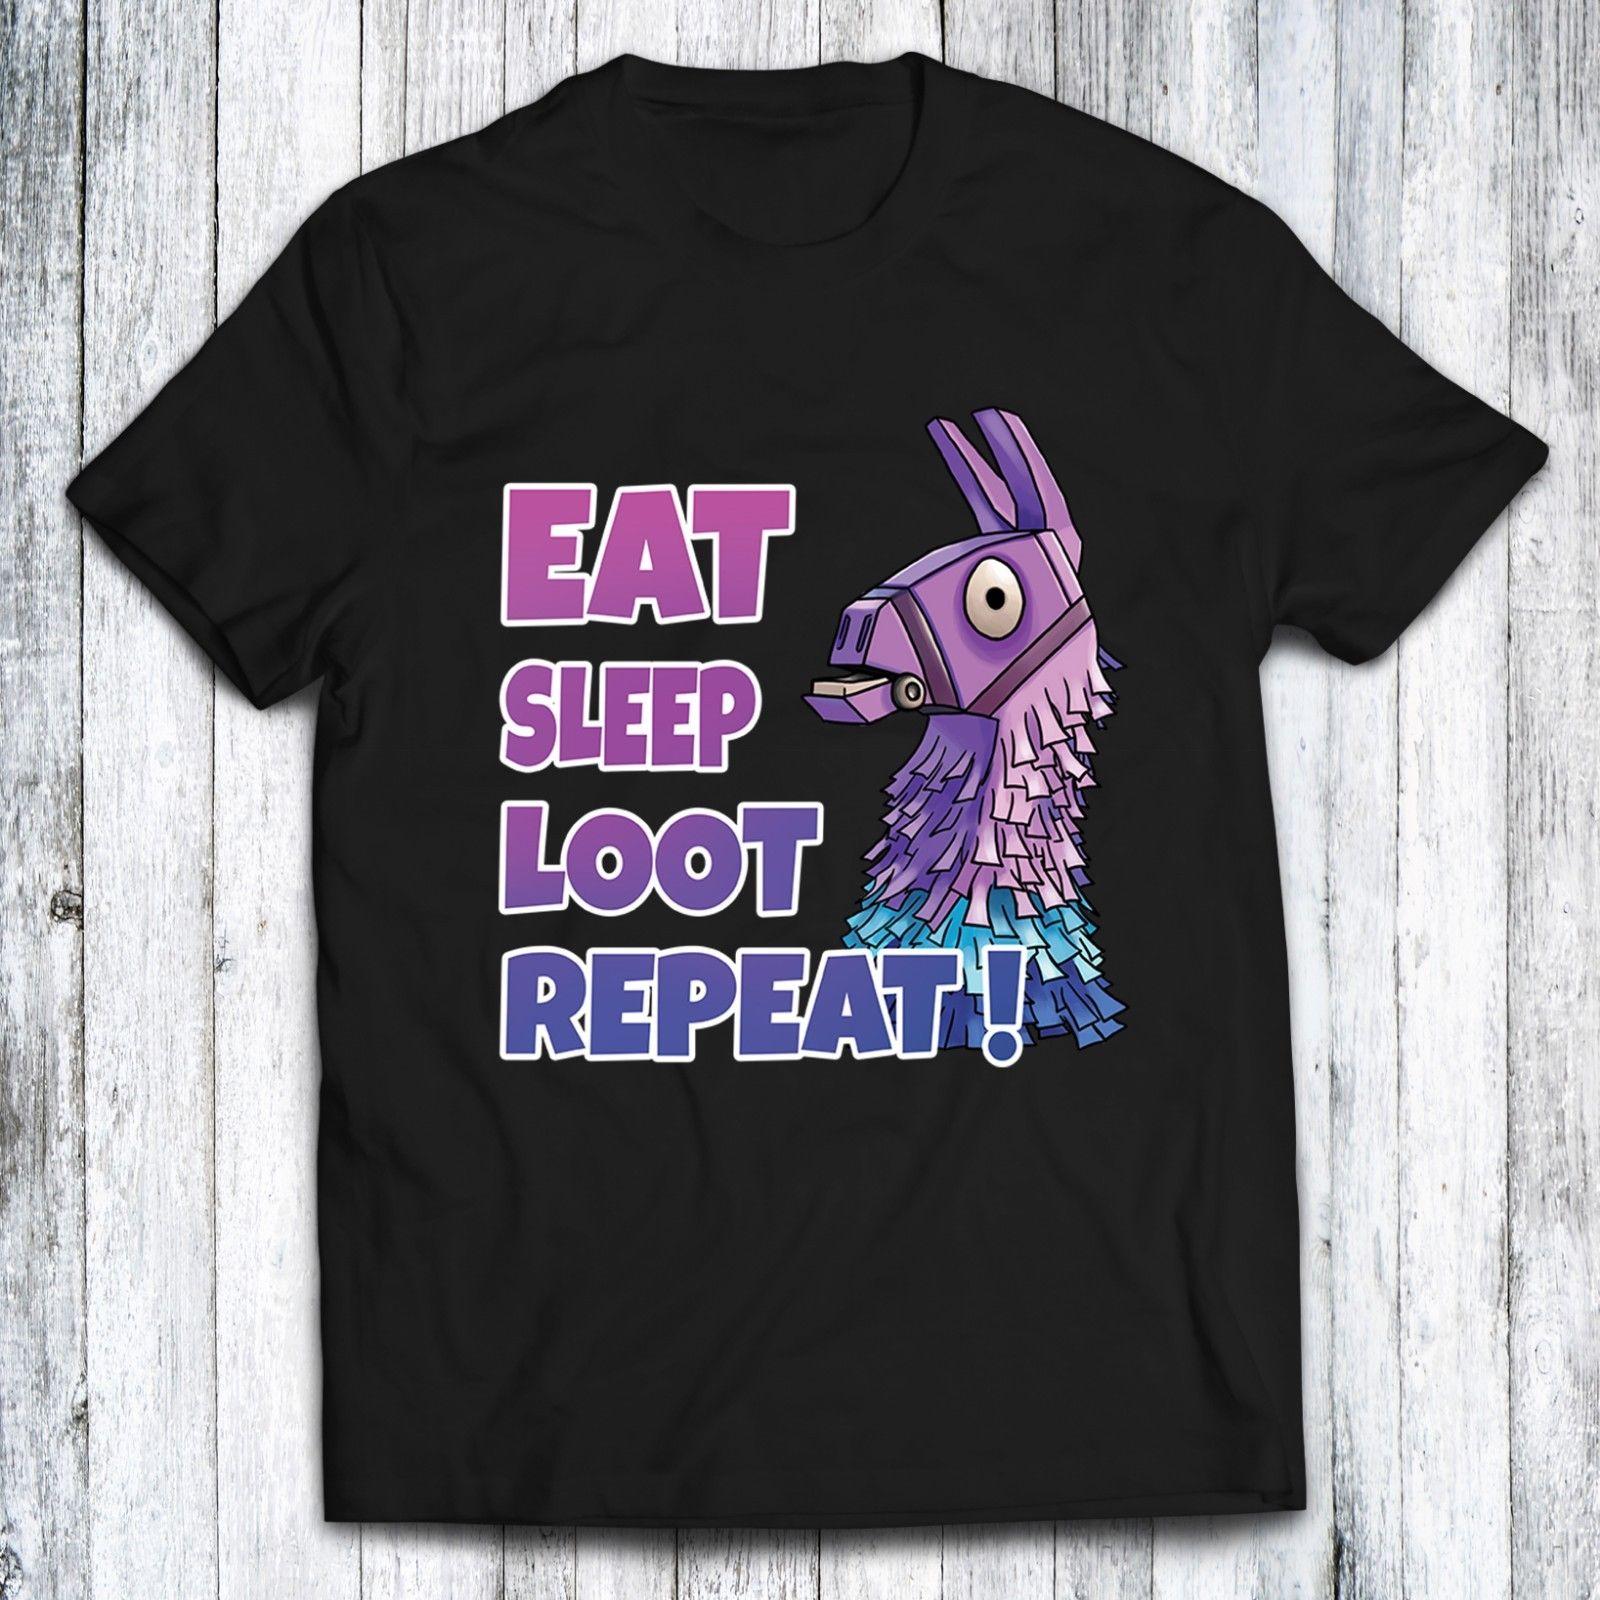 Fort Eat Sleep Loot Repeat Battle Royale -Black White T-shirt Funny Gaming Free shipping Harajuku Tops t shirt Fashion